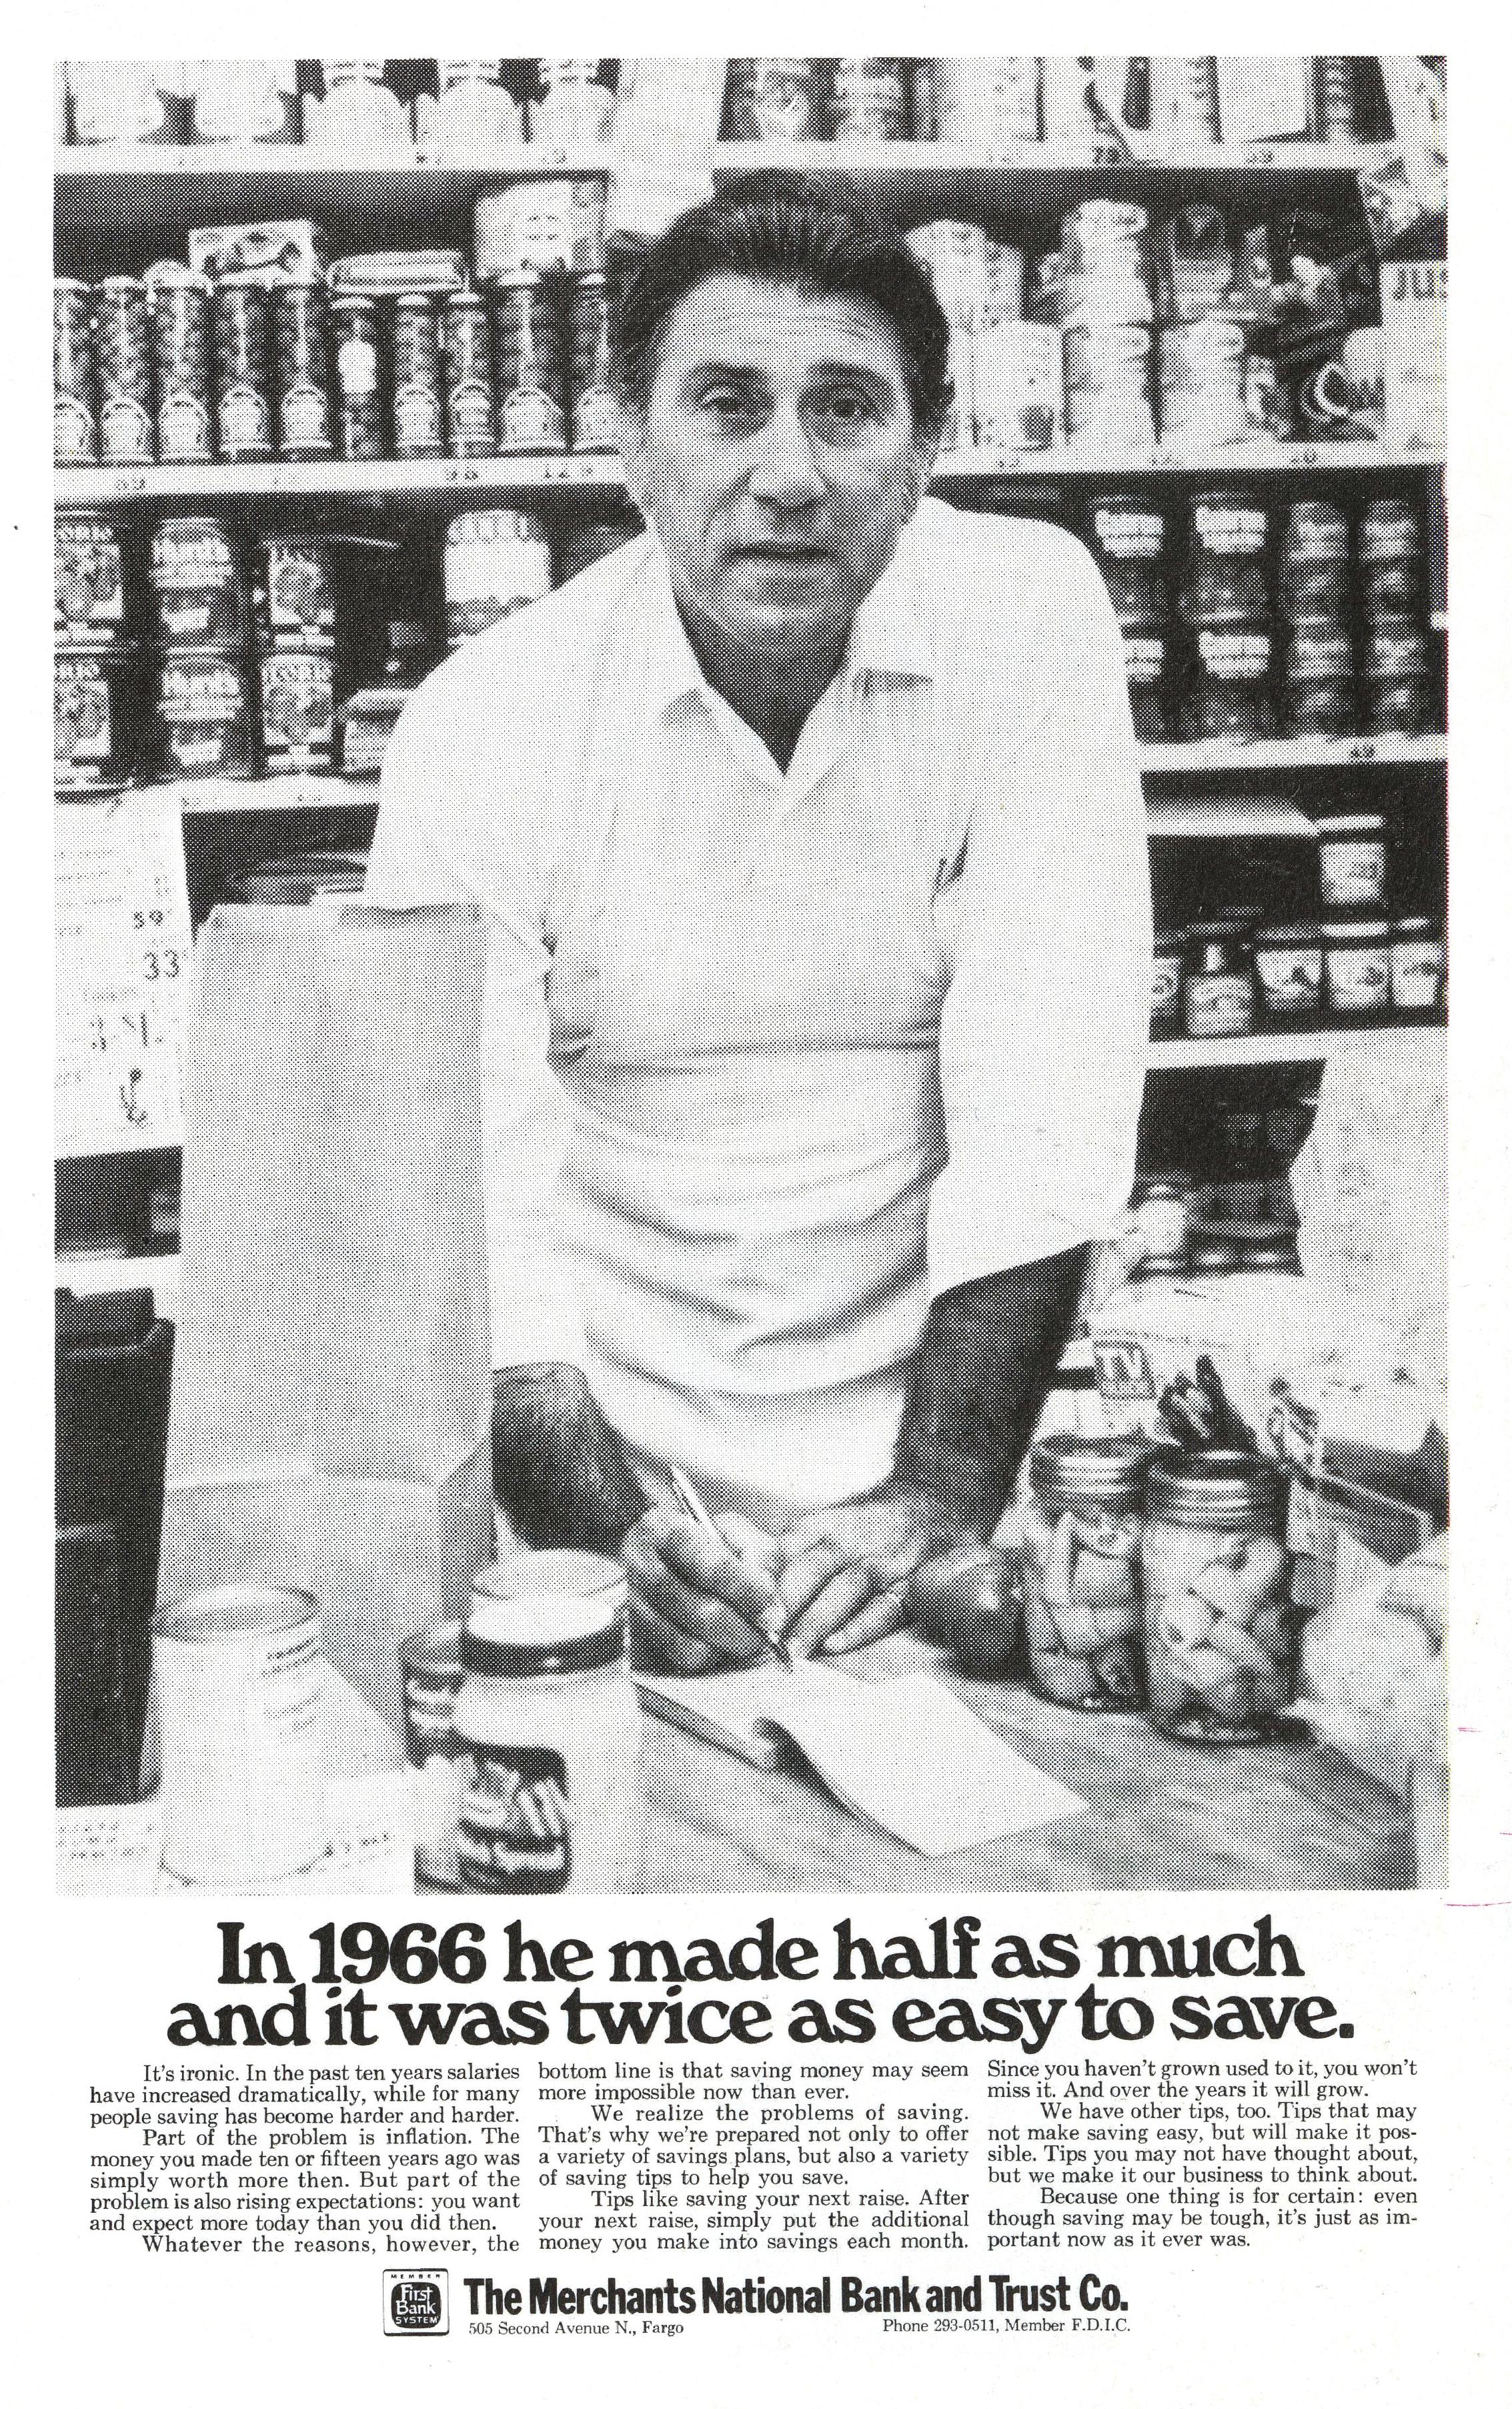 in-1966-the-merchants-nationaltom-mcelligott-bozell